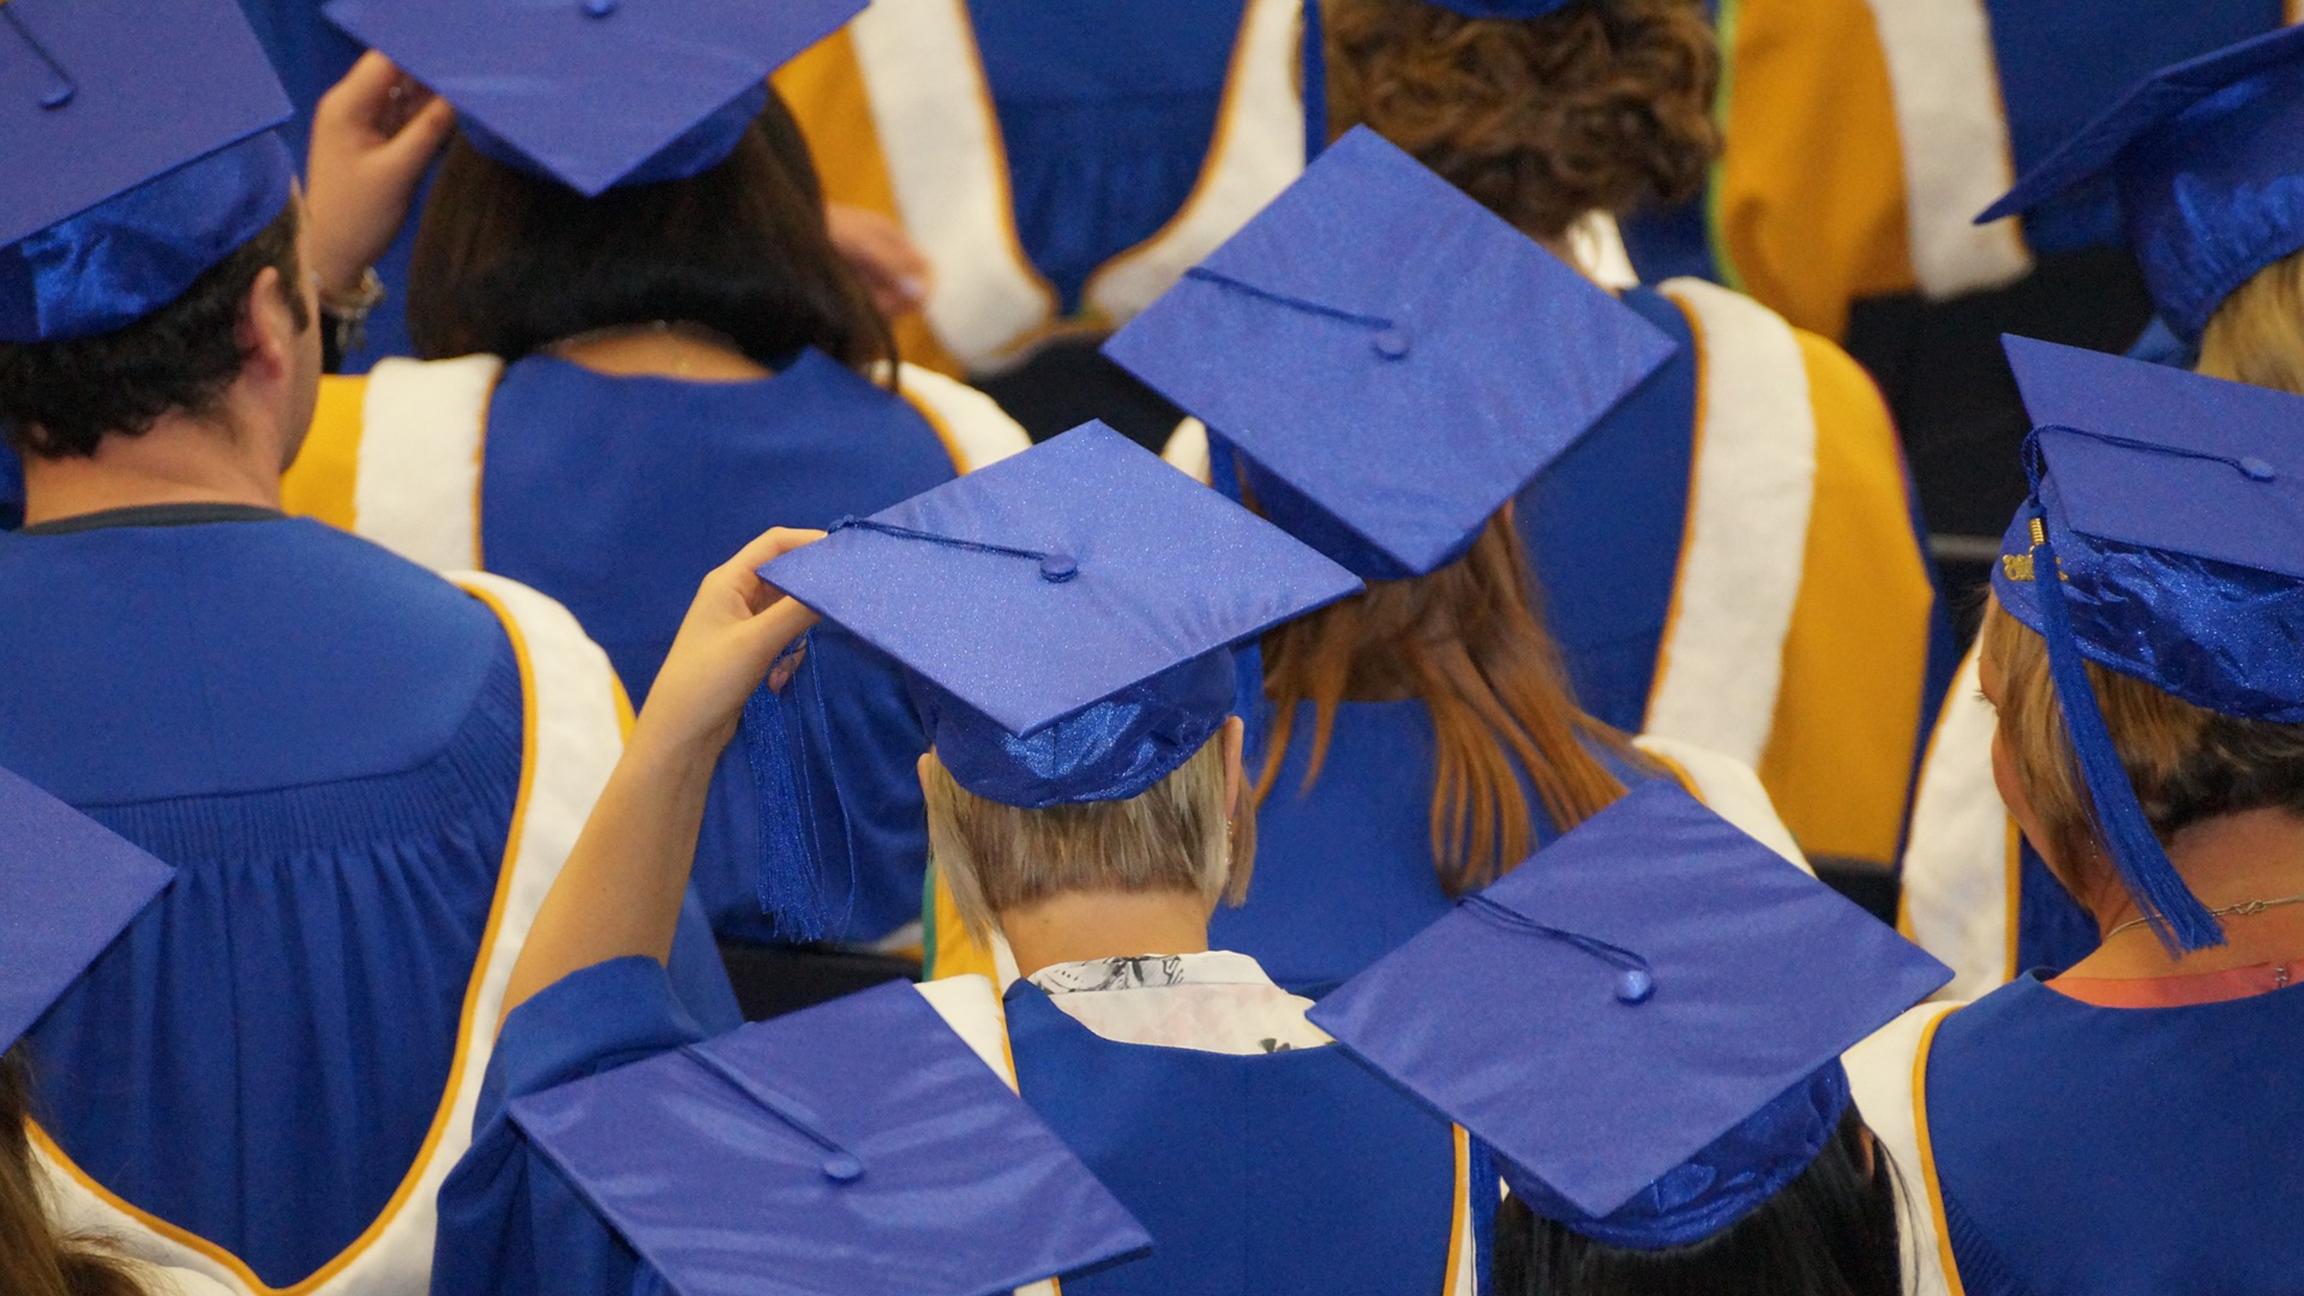 CPS Graduation Rate Rises as Enrollment Rate Drops | Chicago